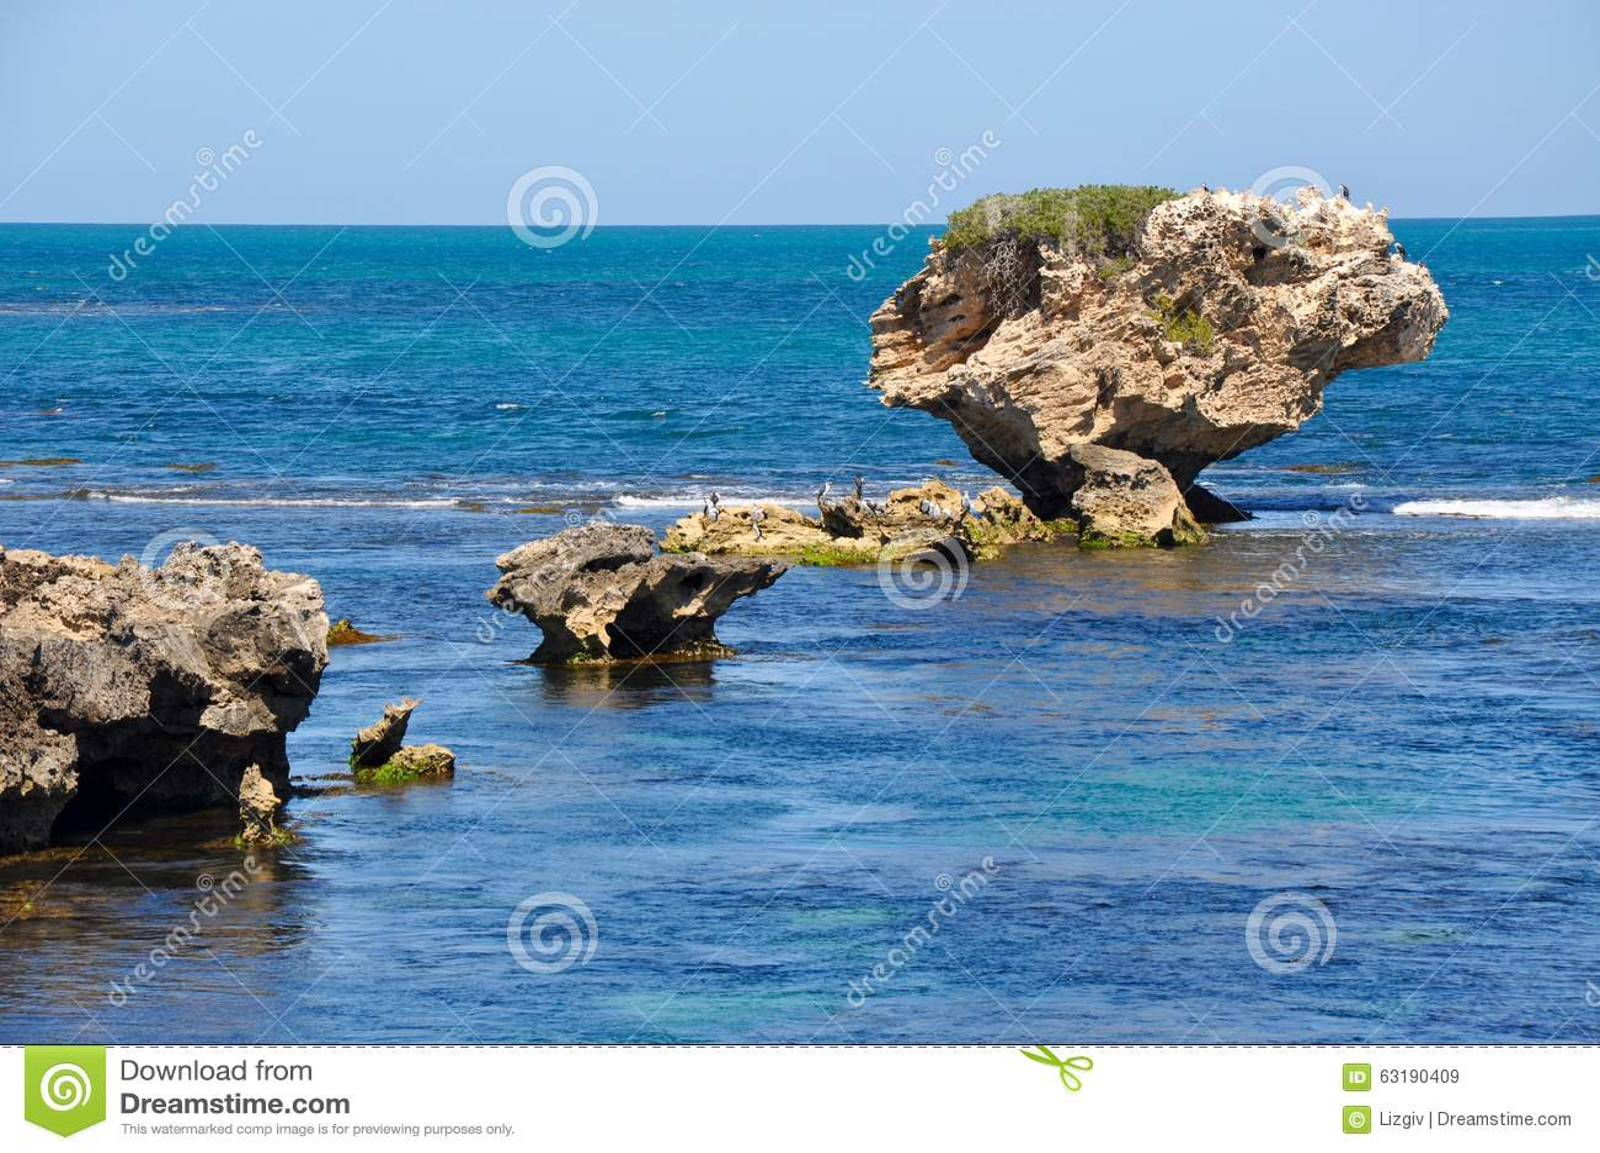 hindu singles in rocky point Sonoran sky resort in rocky point (puerto penasco), sonora, mexico the sonoran sky resort in rocky point, mexico, rises above sandy beach in a single tower.